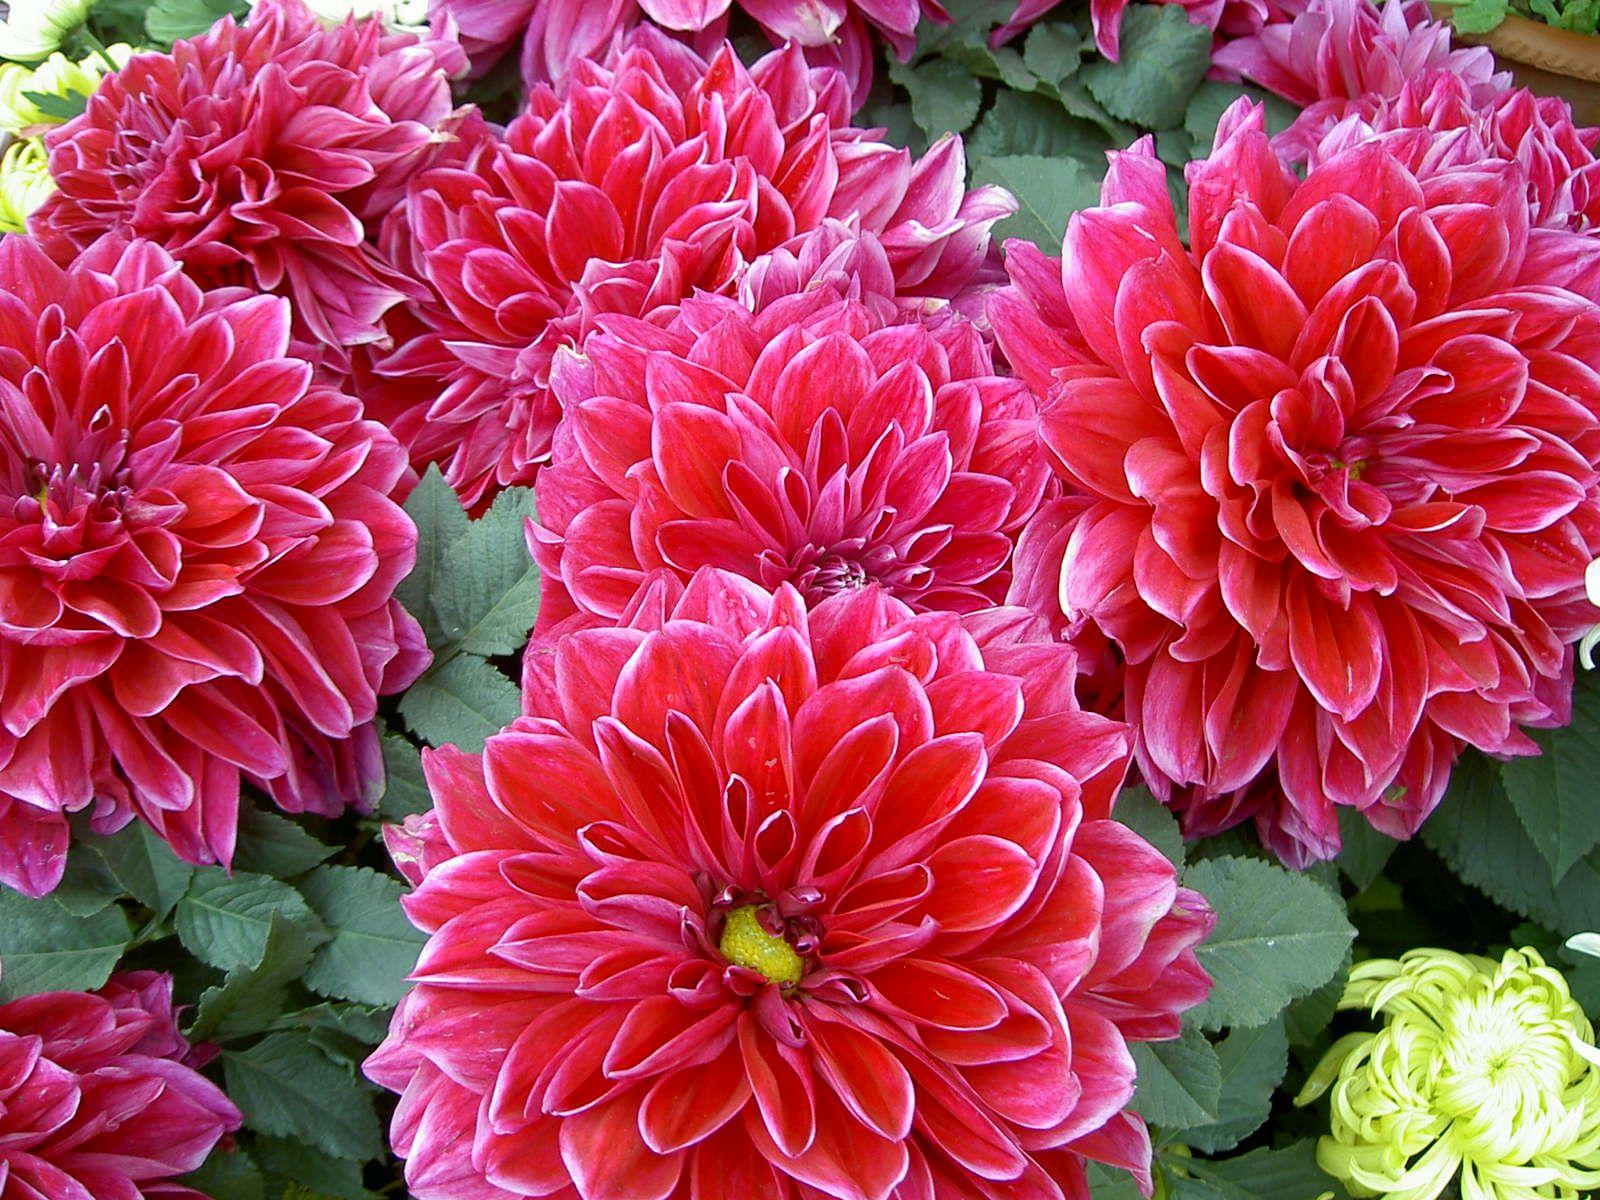 Chrysanthemum chrysanthemum red chrysanthemum red